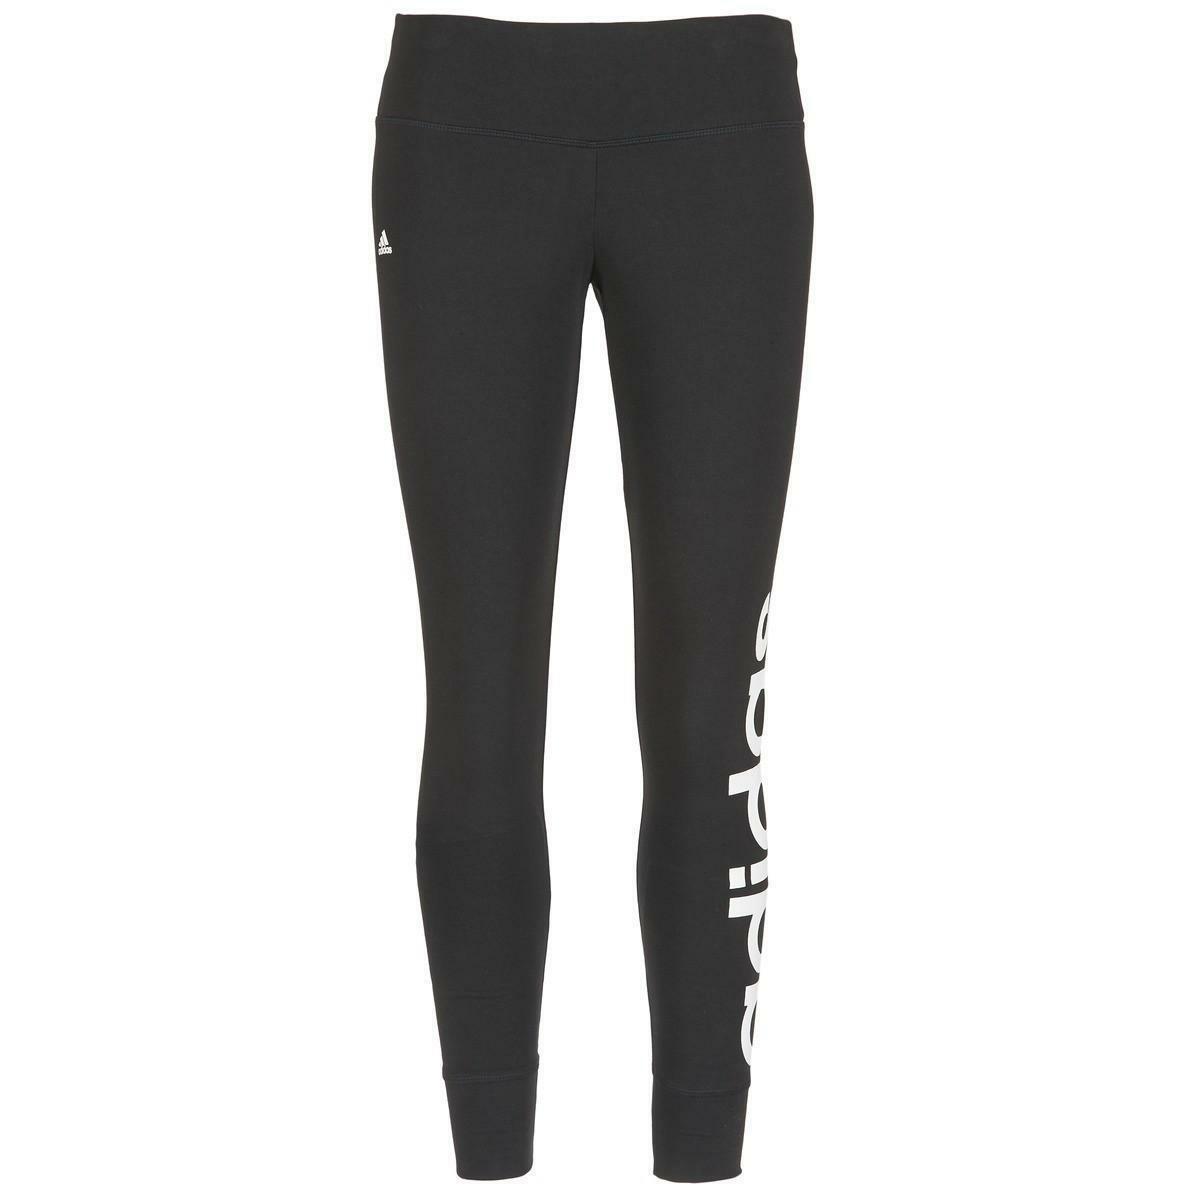 adidas adidas ess lineartight pantaloni stretch donna neri aj4594